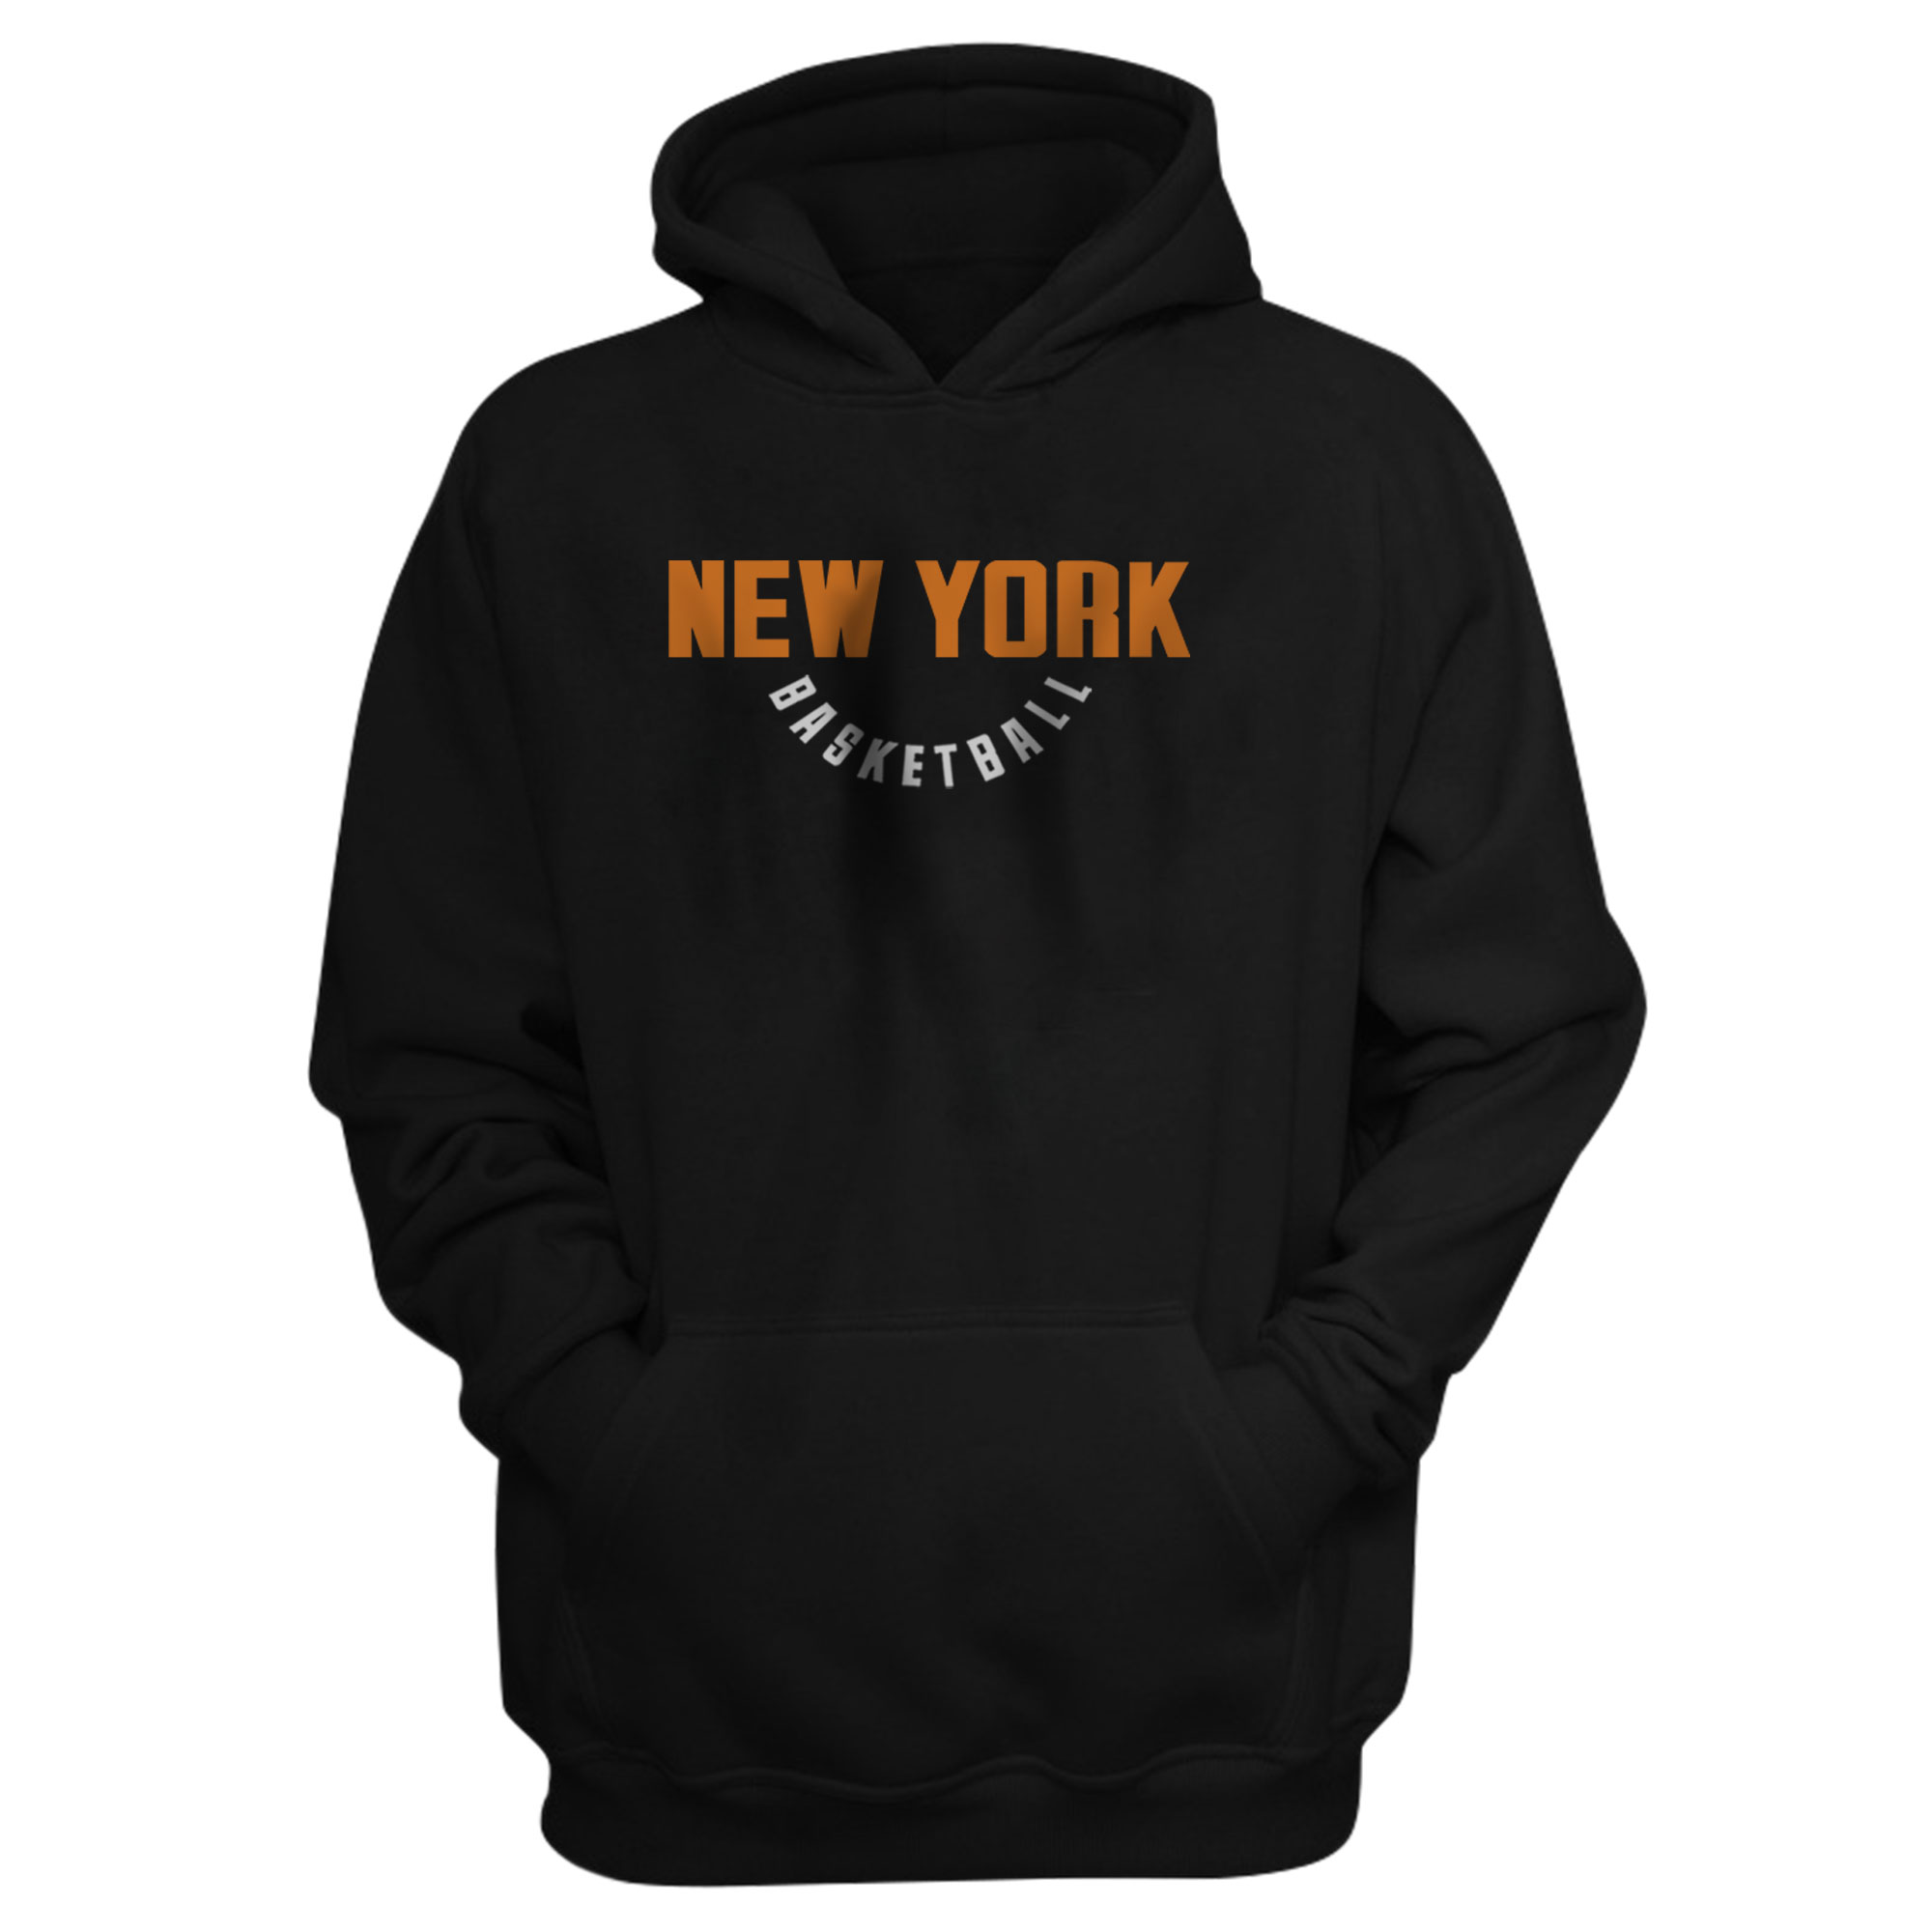 New York Knicks Basketball Hoodie (HD-BLU-273-york-bsktbll)